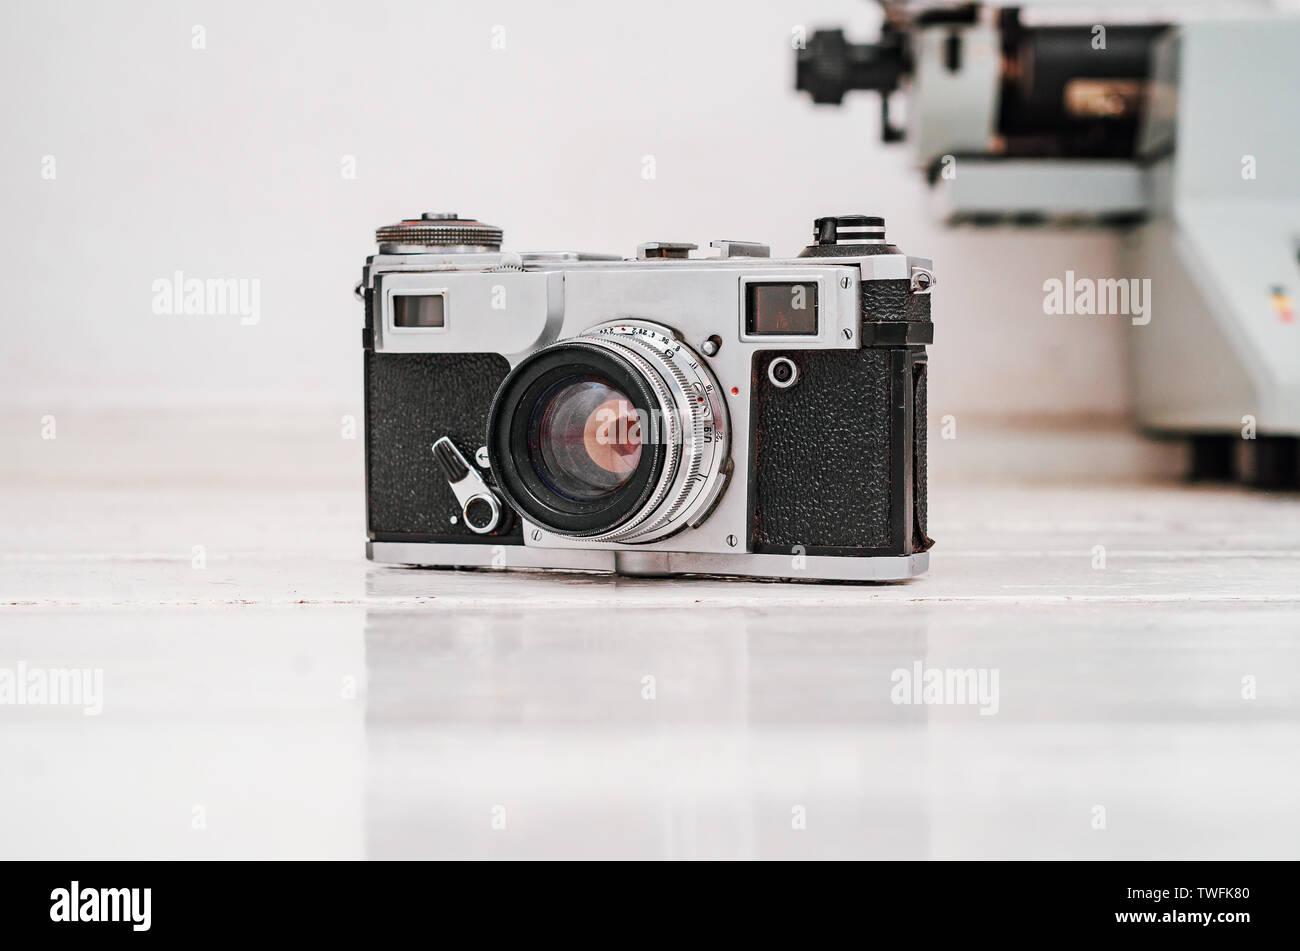 Old film camera on white plank background. Typewriter on the background. Vintage photo. Stock Photo